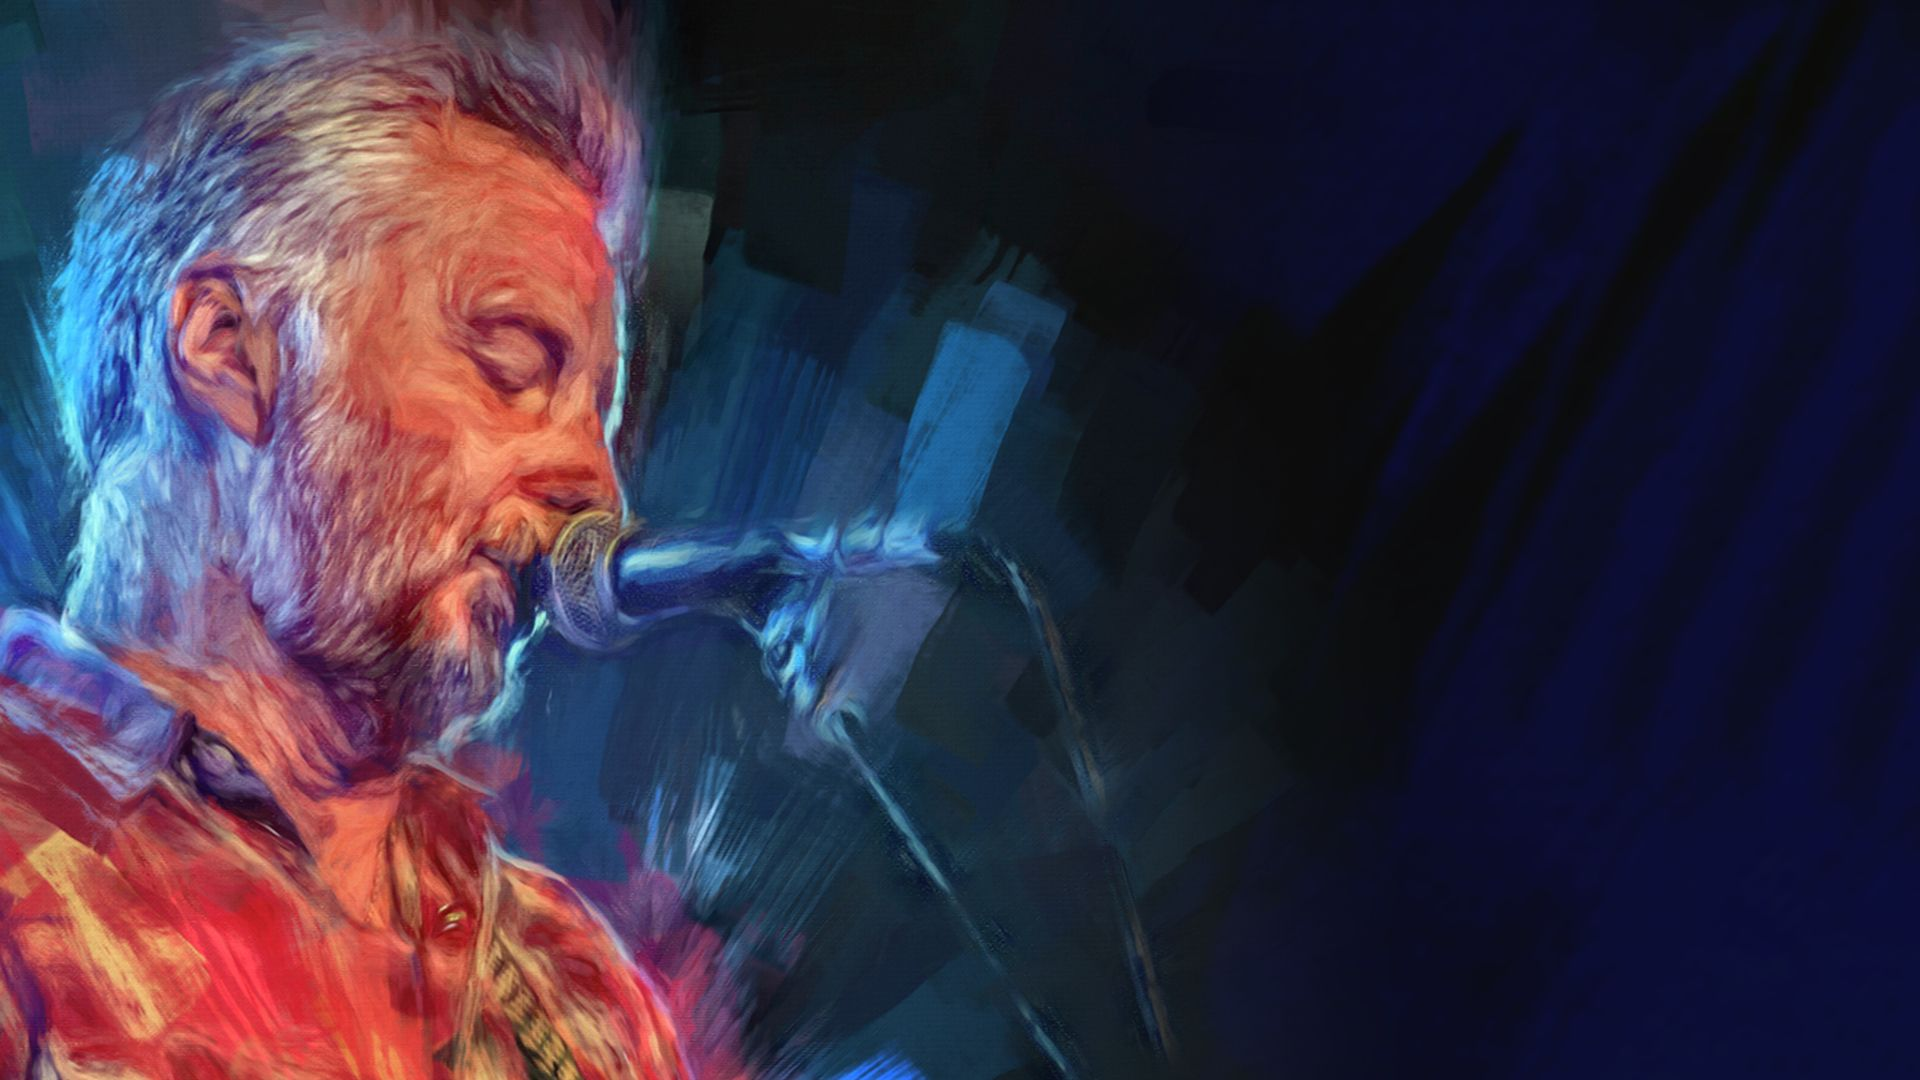 Billy Bragg Live at New Theatre Oxford